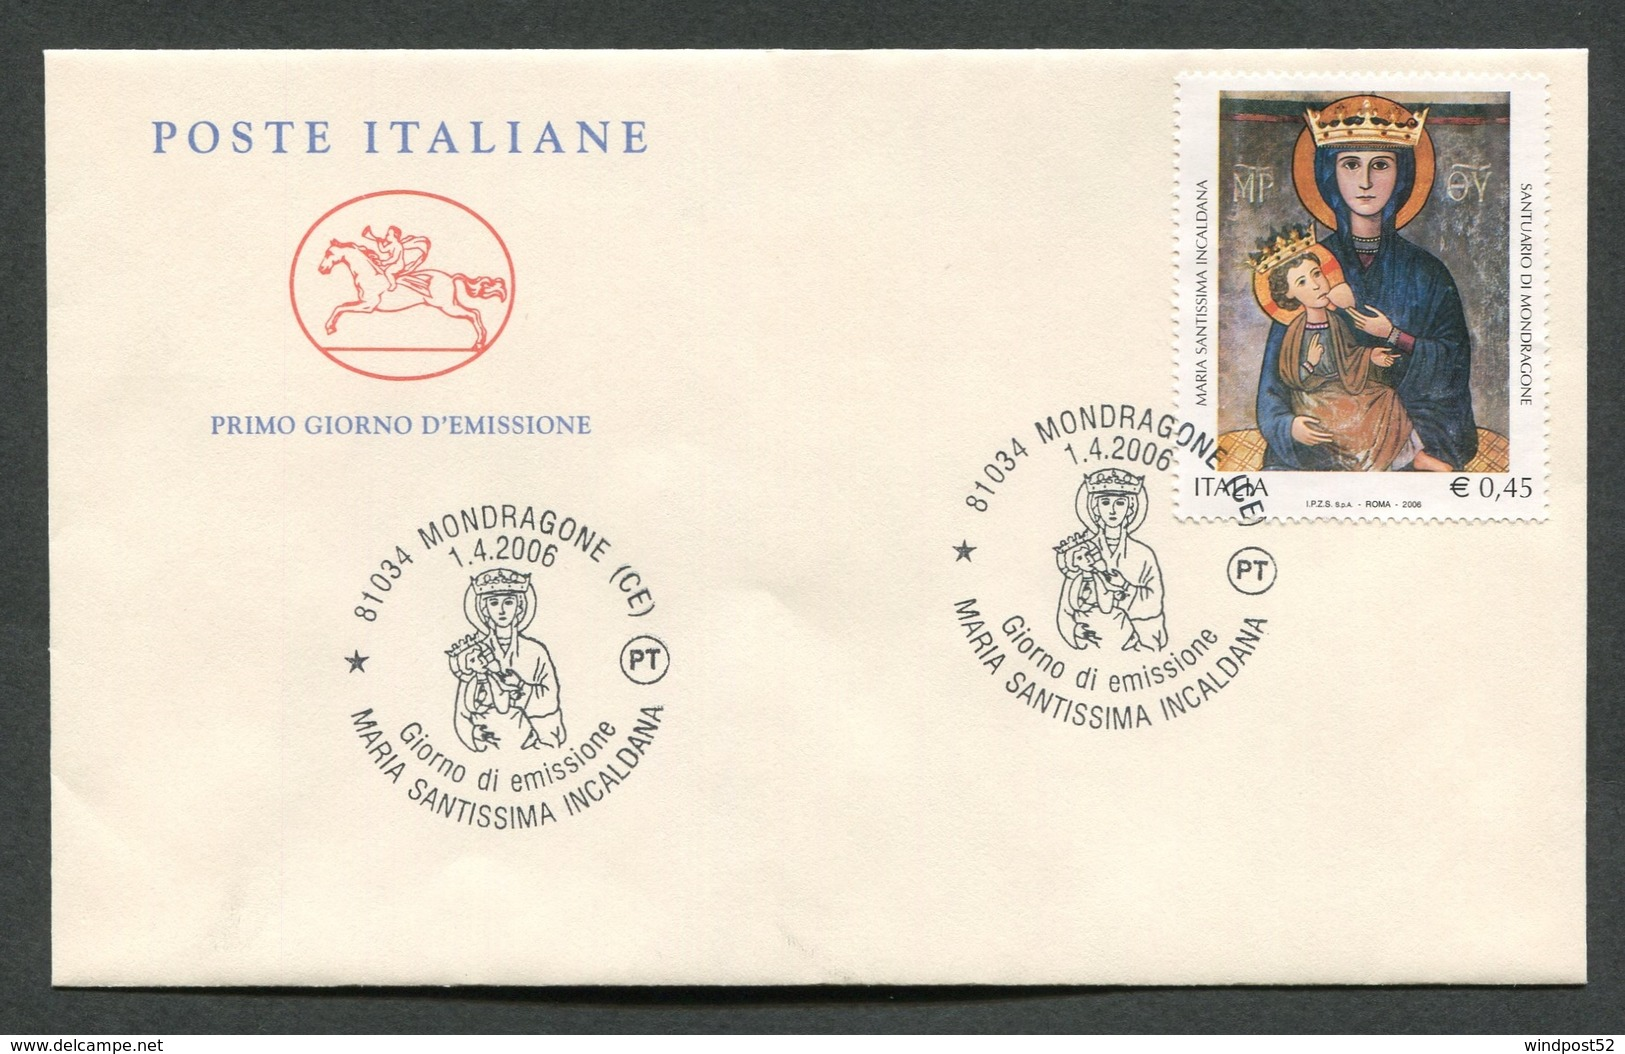 FDC ITALIA 2006 - CAVALLINO - MARIA SANTISSIMA INCALDANA - MONDRAGONE ( CE ) - 362 - F.D.C.